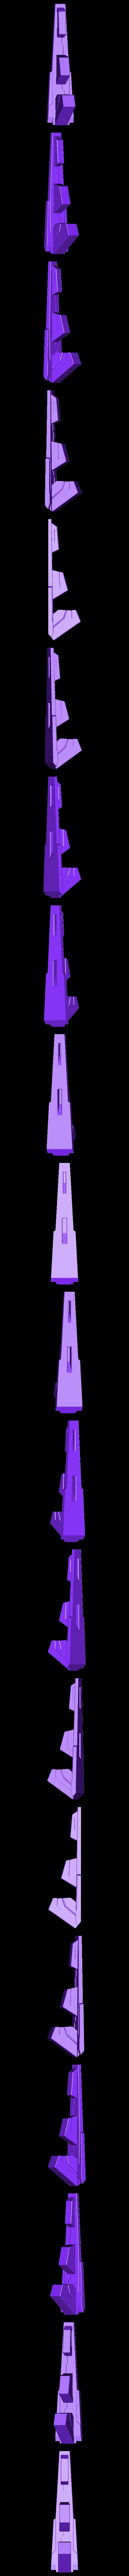 36_Drag_Waist9_TailSpike_GREY.stl Download STL file ARTICULATED DRAGONLORD (not Dragonzord) - NO SUPPORT • 3D printer model, Toymakr3D